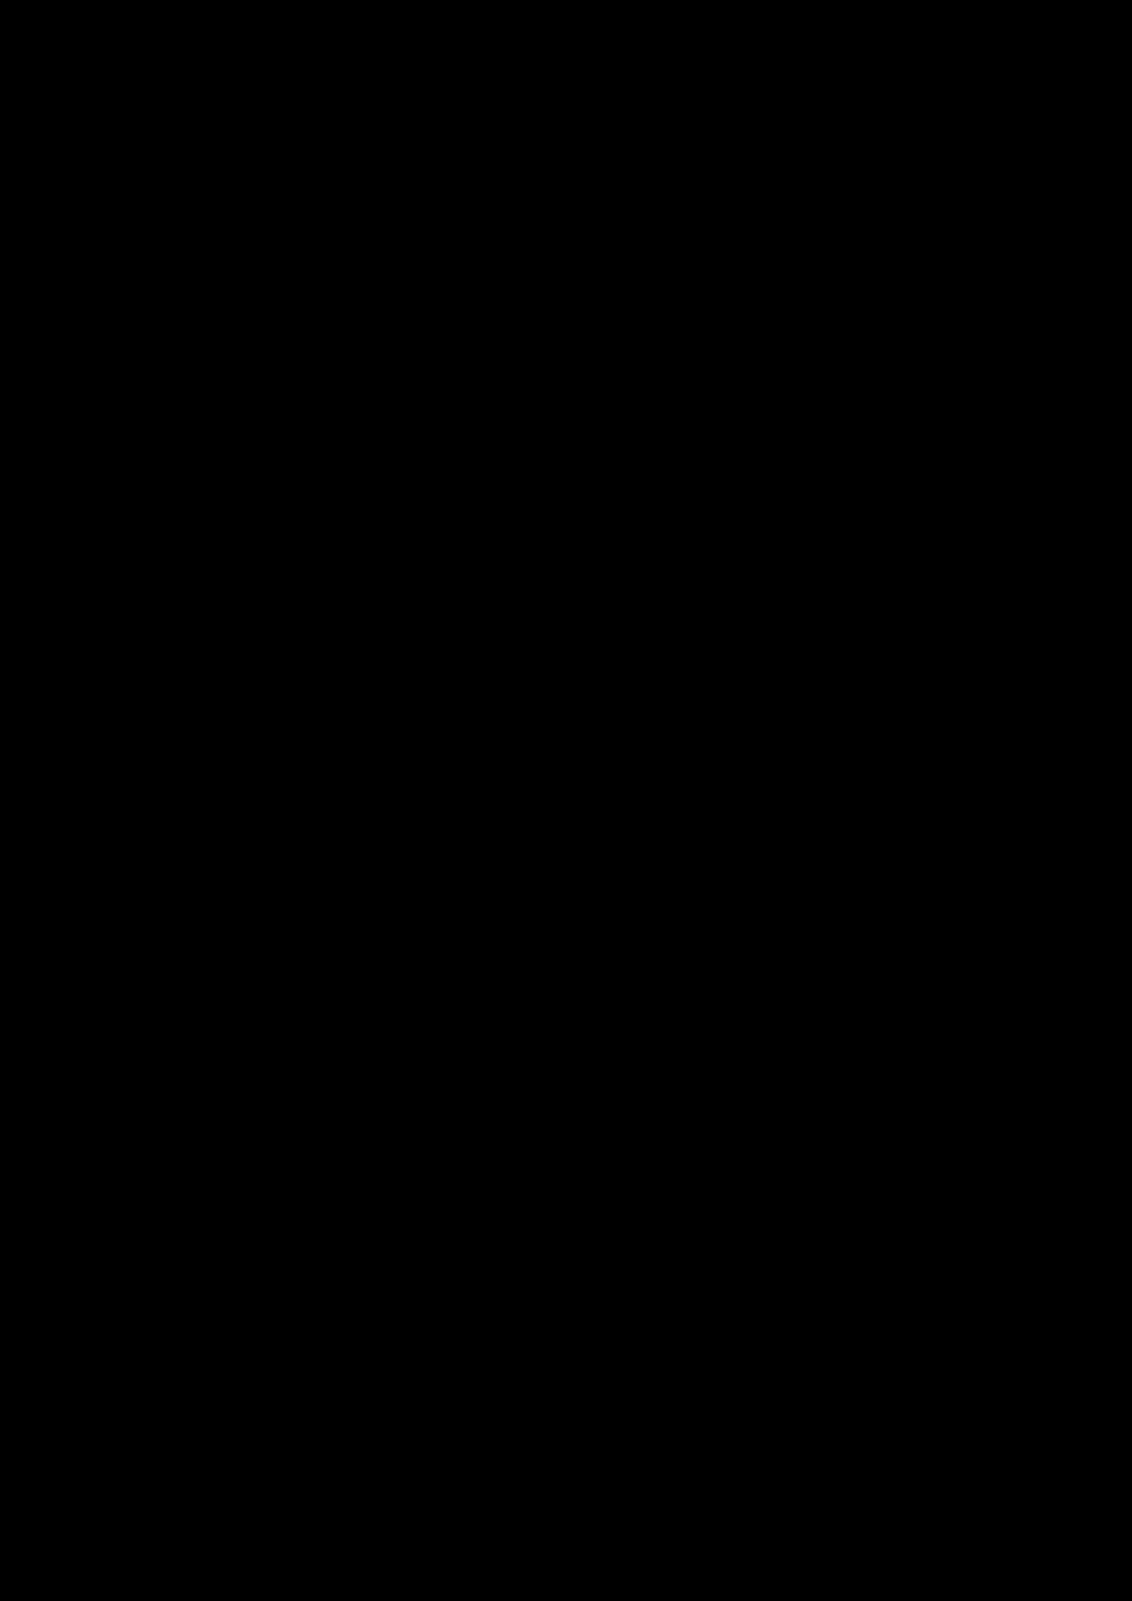 Belyiy sokol slide, Image 179